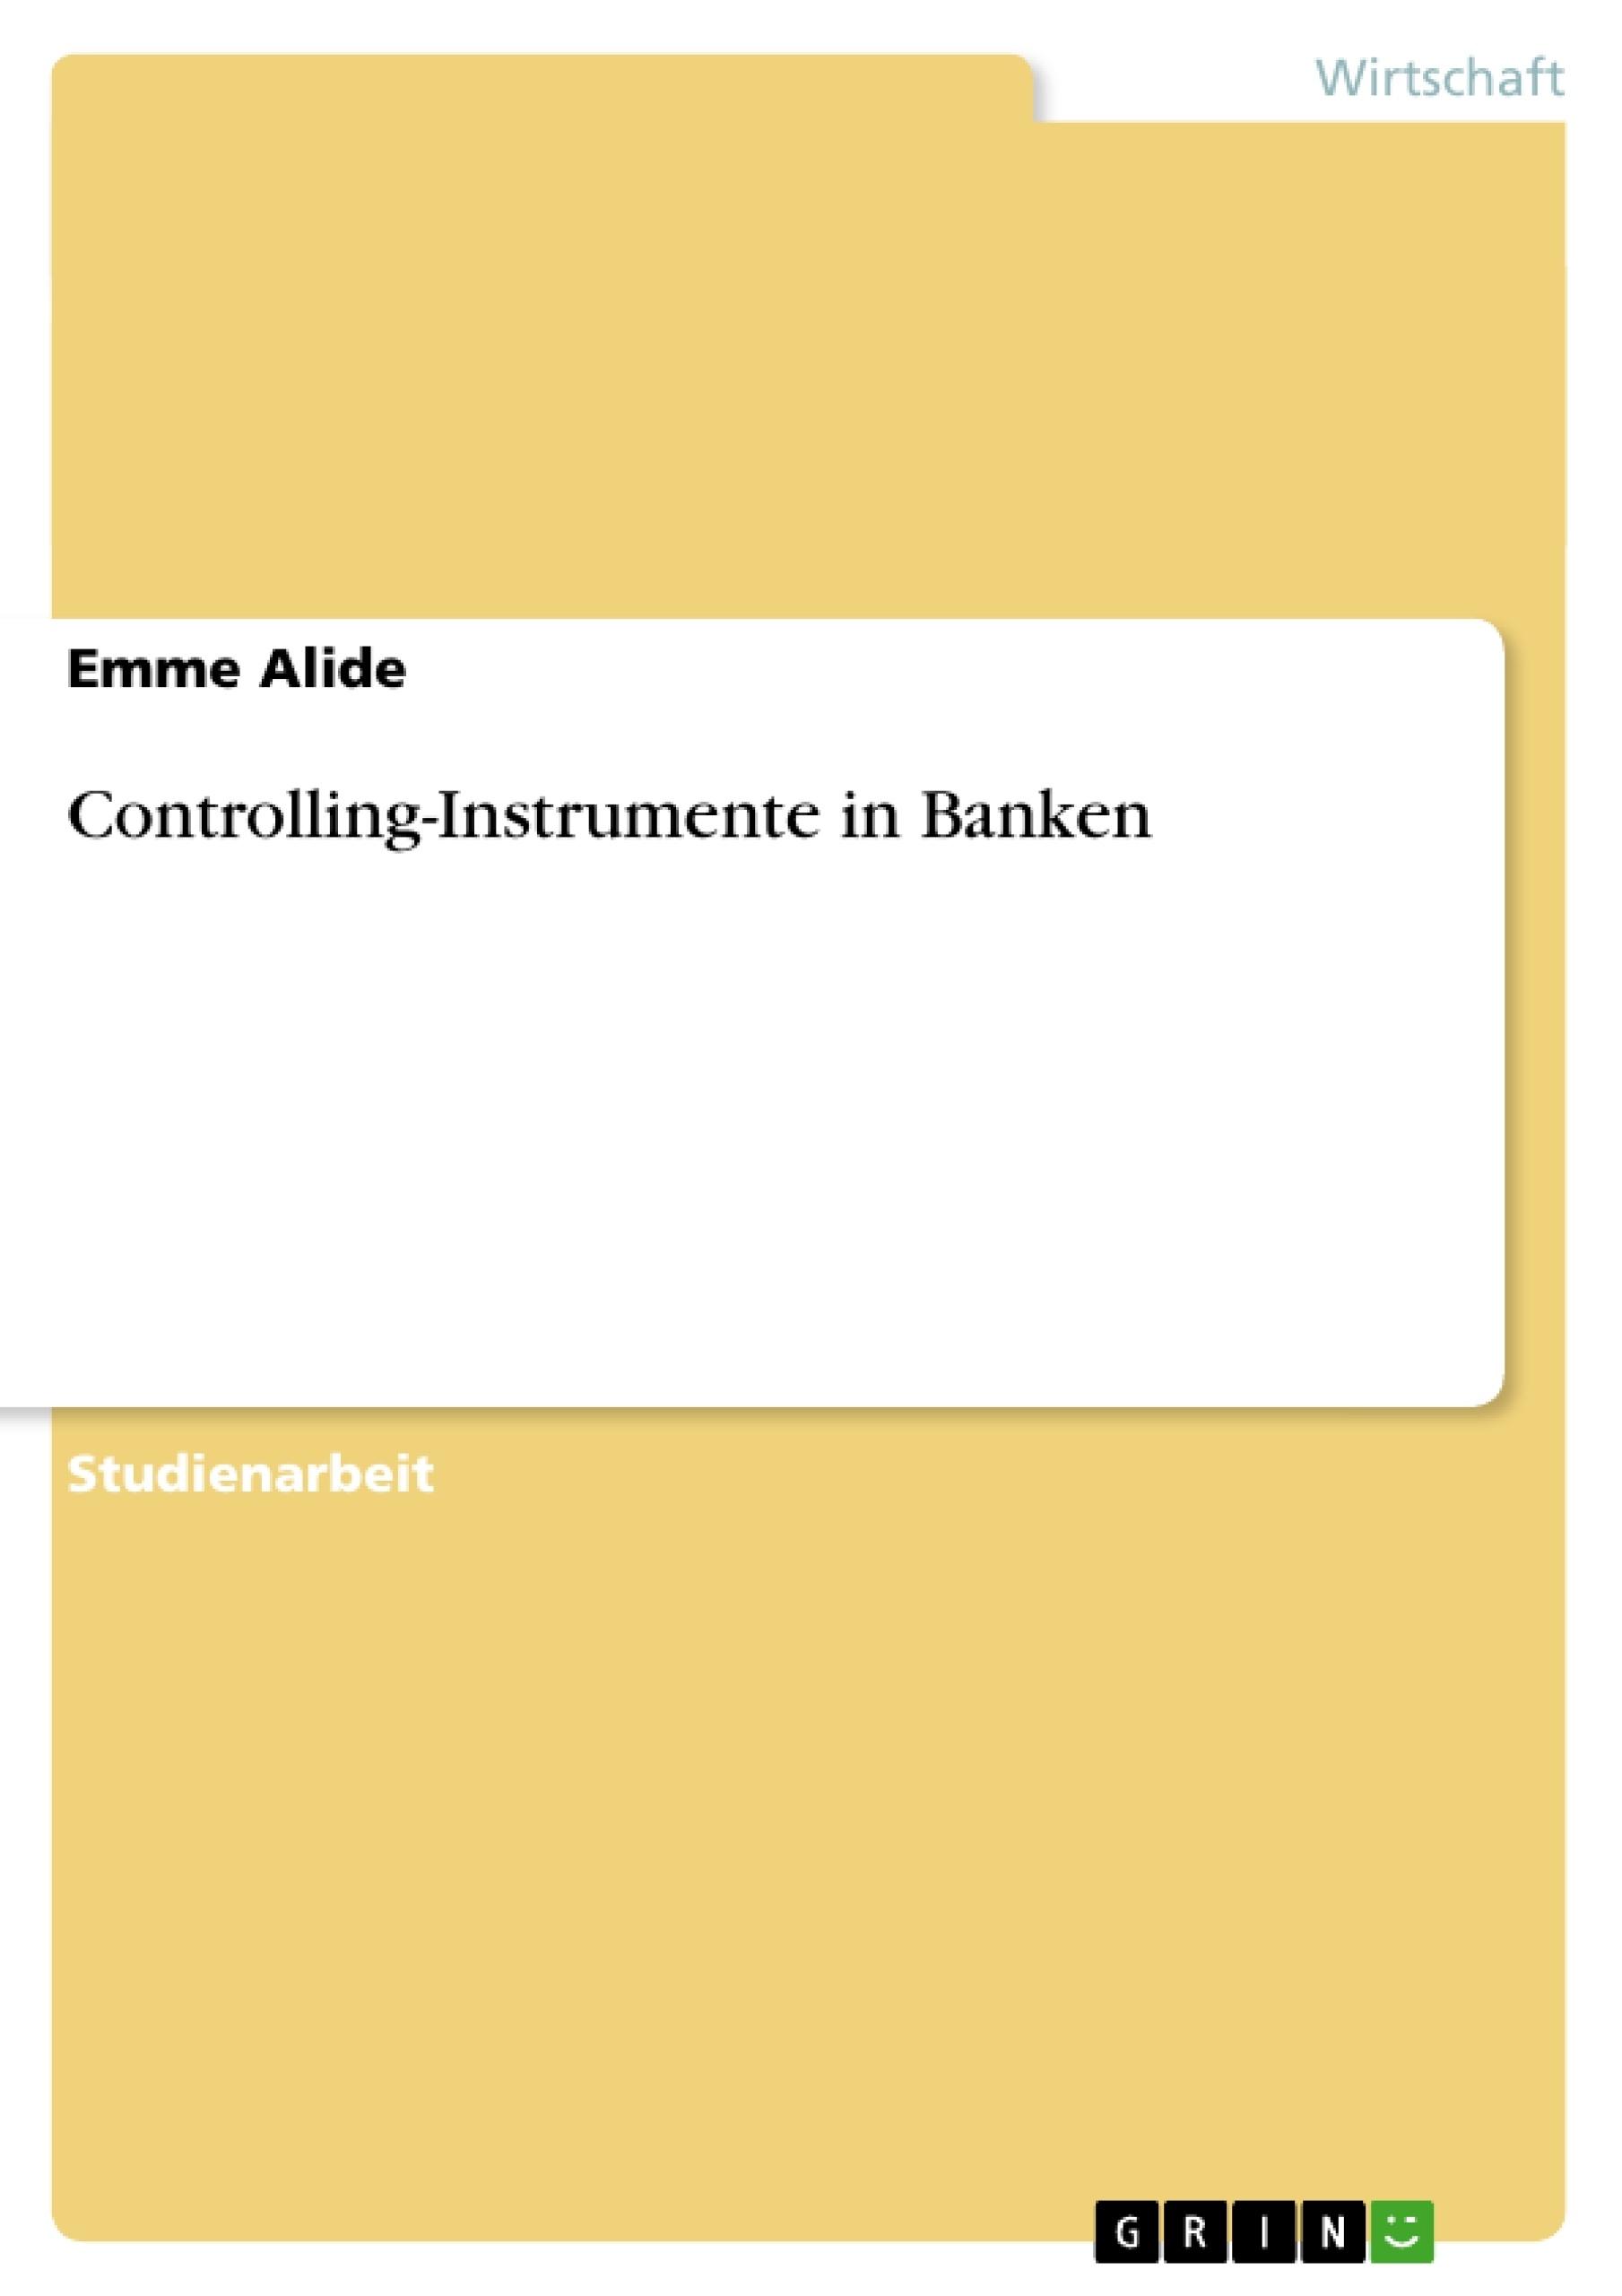 Titel: Controlling-Instrumente in Banken